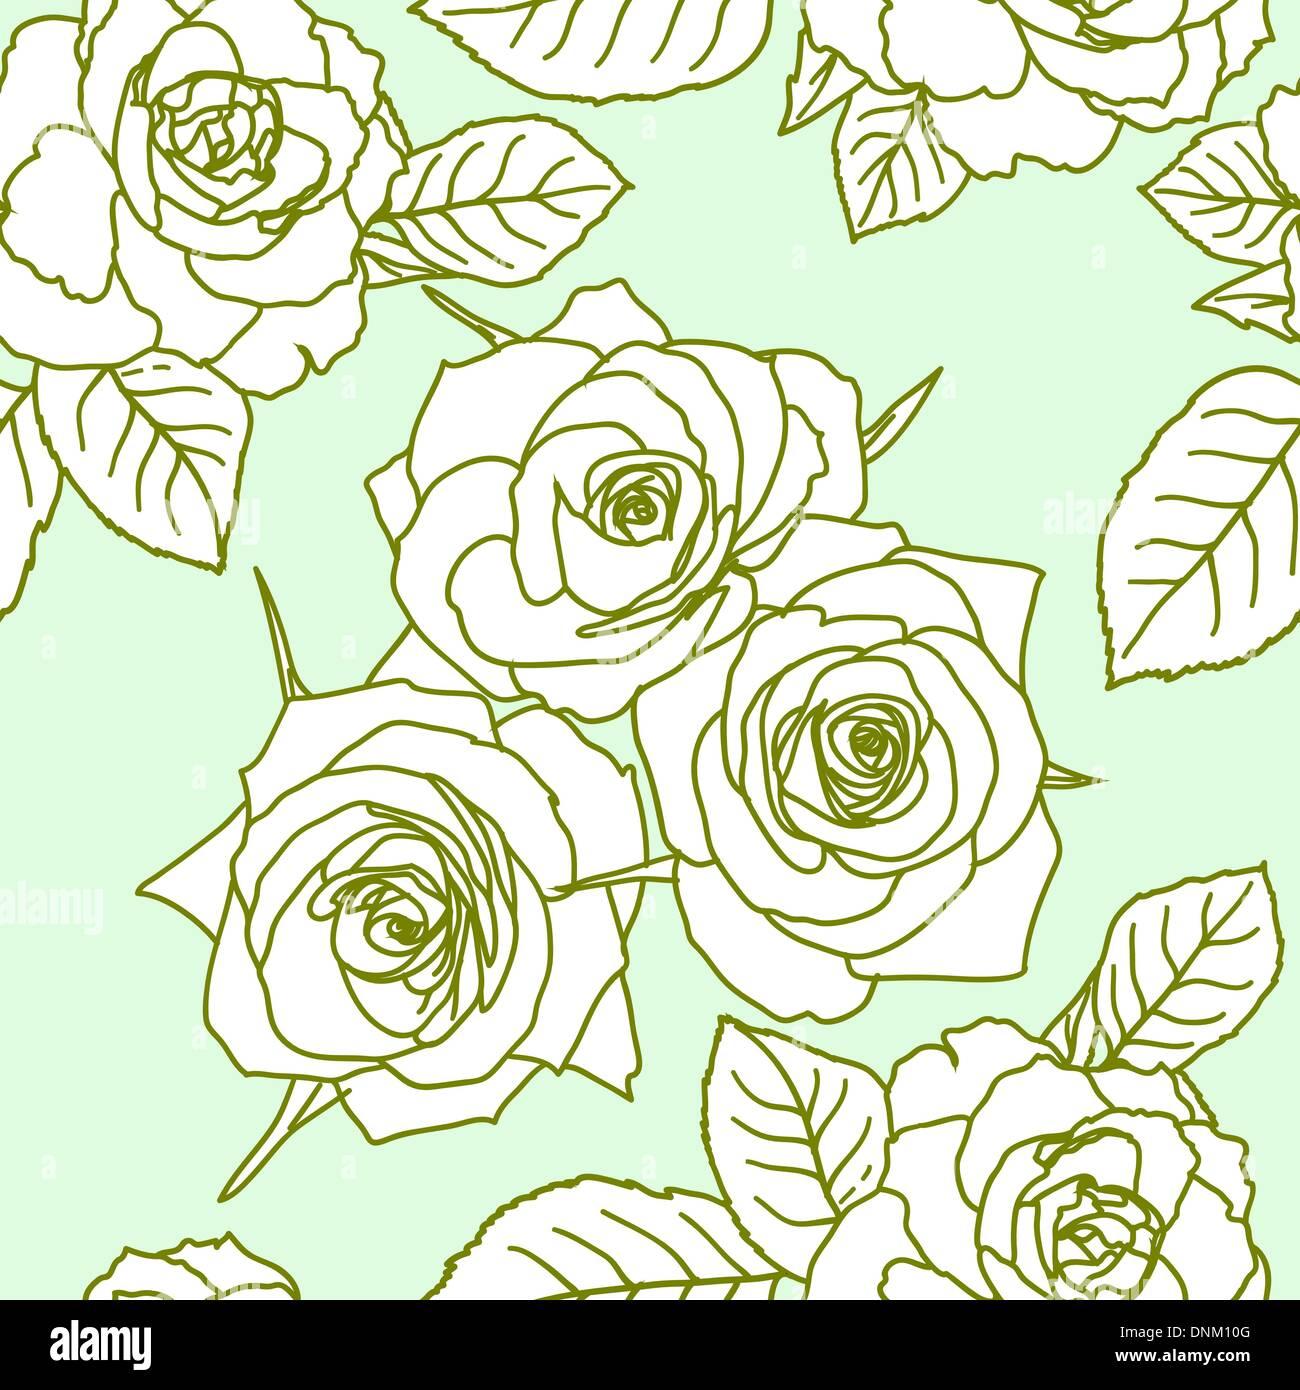 Papel tapiz perfecta con rosas flores Imagen De Stock